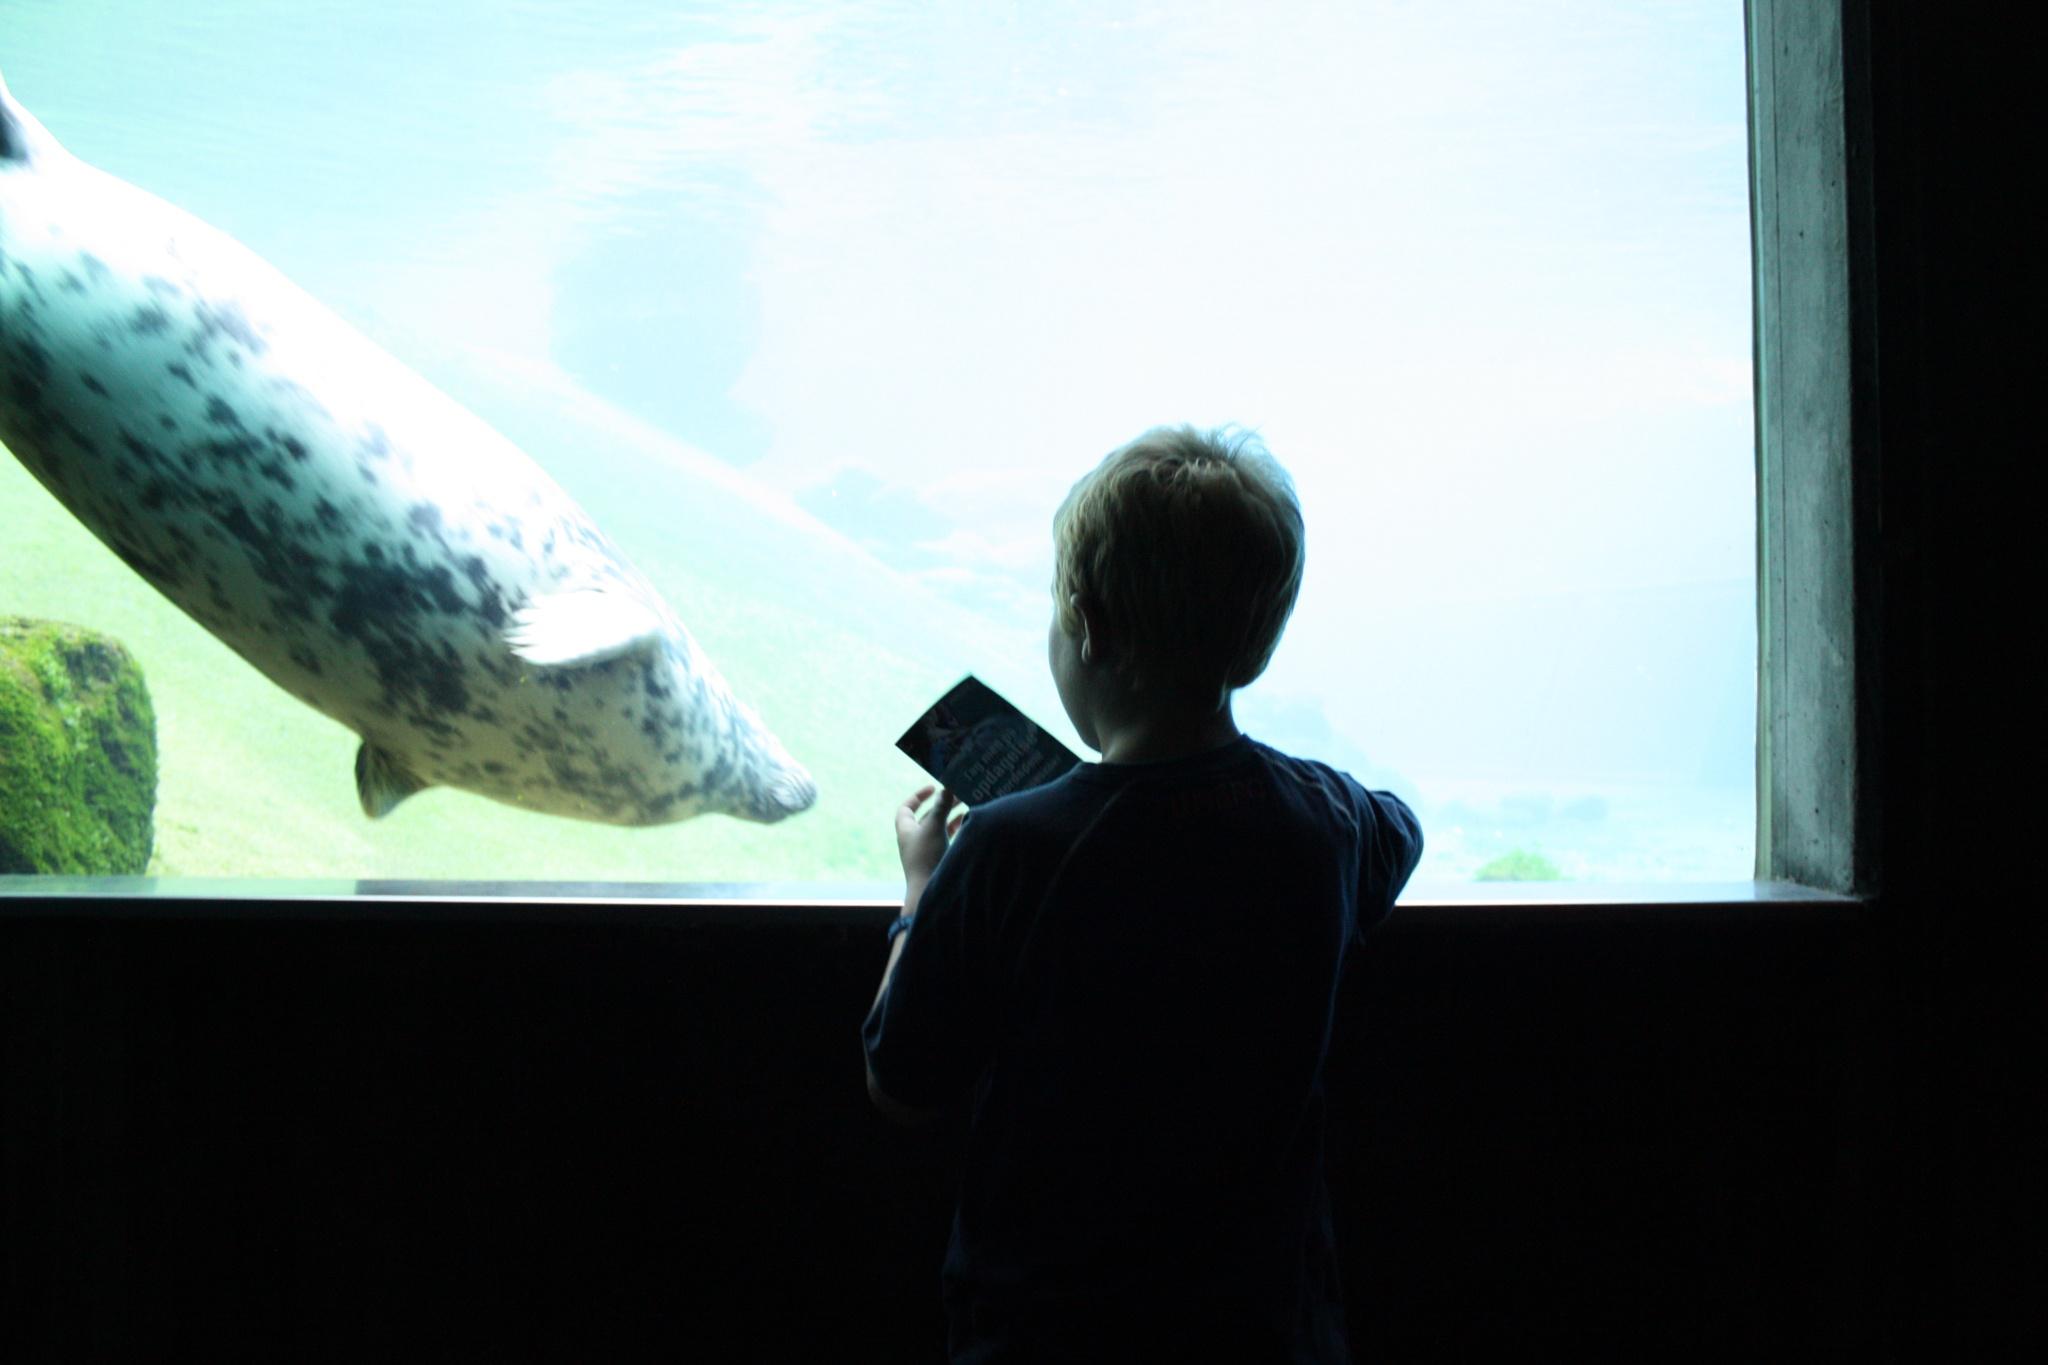 Boy and sealion by Espen Øien